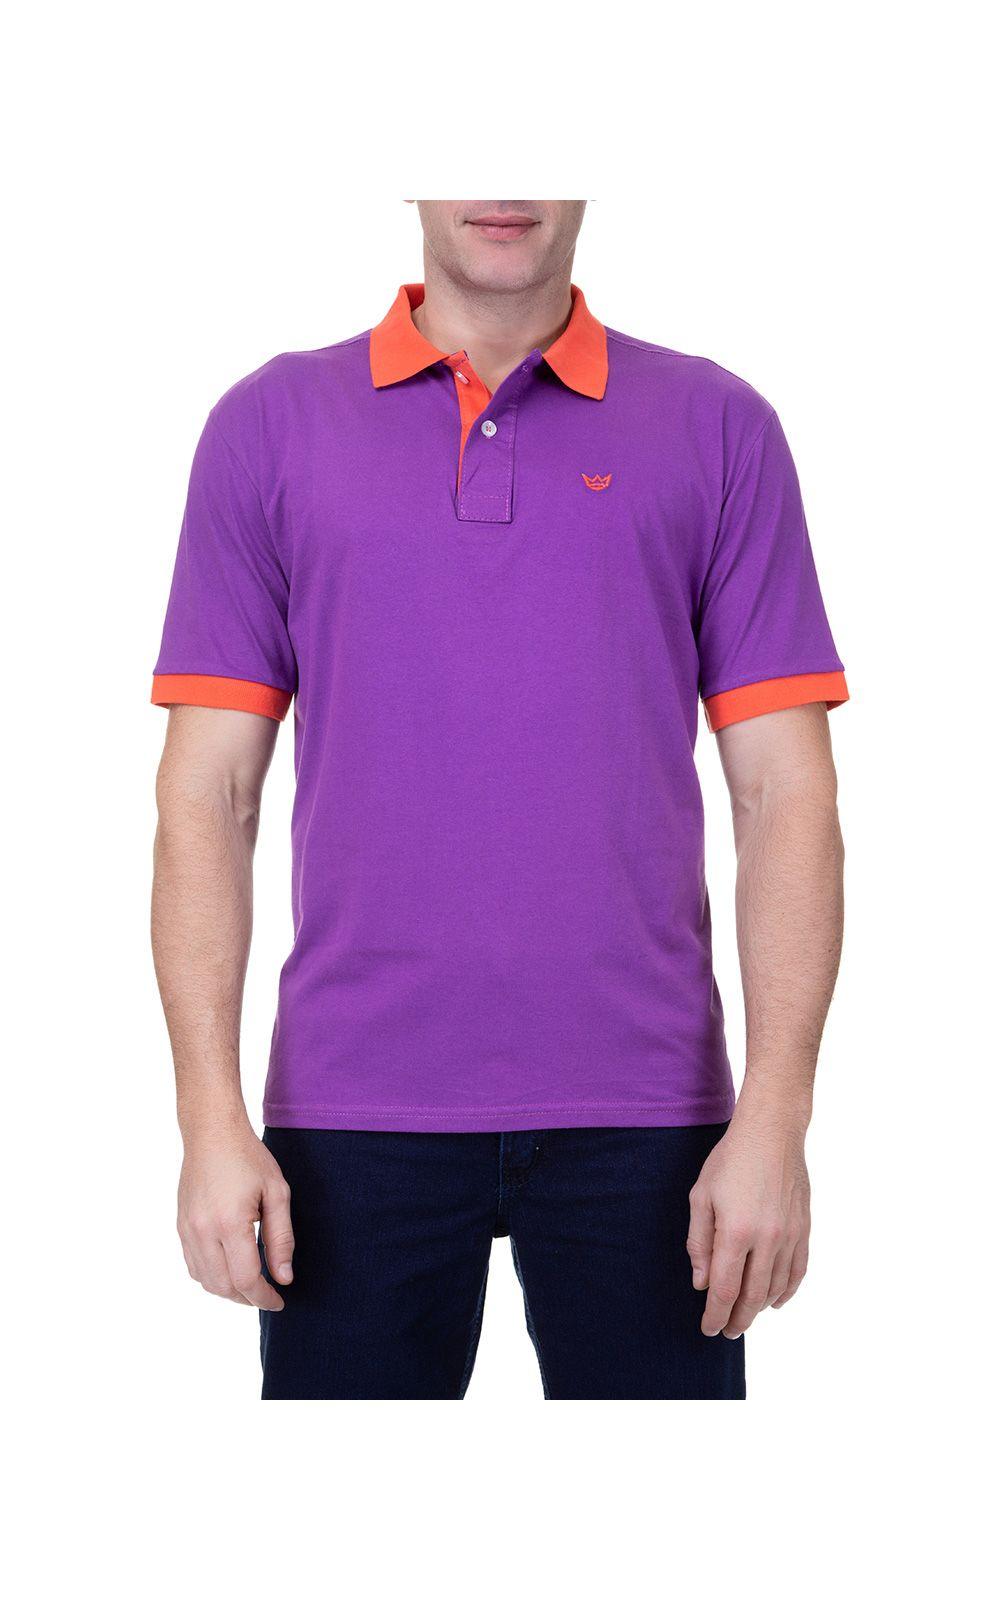 b54e69c72ab8b Camisa Polo Masculina Roxa Detalhada. undefined